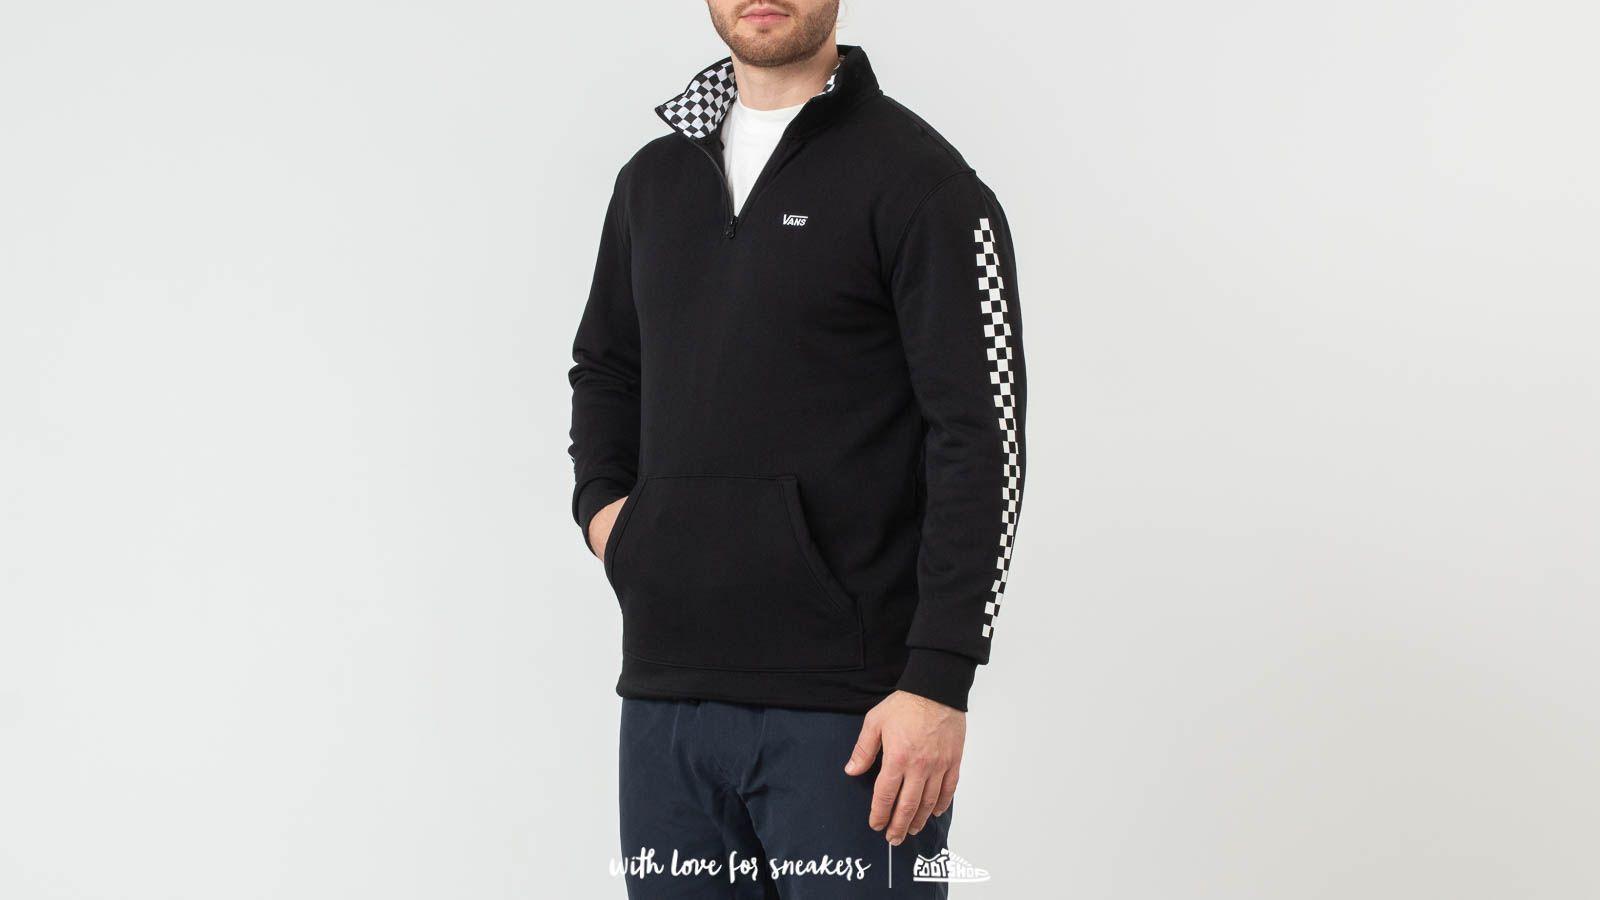 Hoodies and sweatshirts Vans Versa Qzp Sweatshirt Black/ Checkerboard